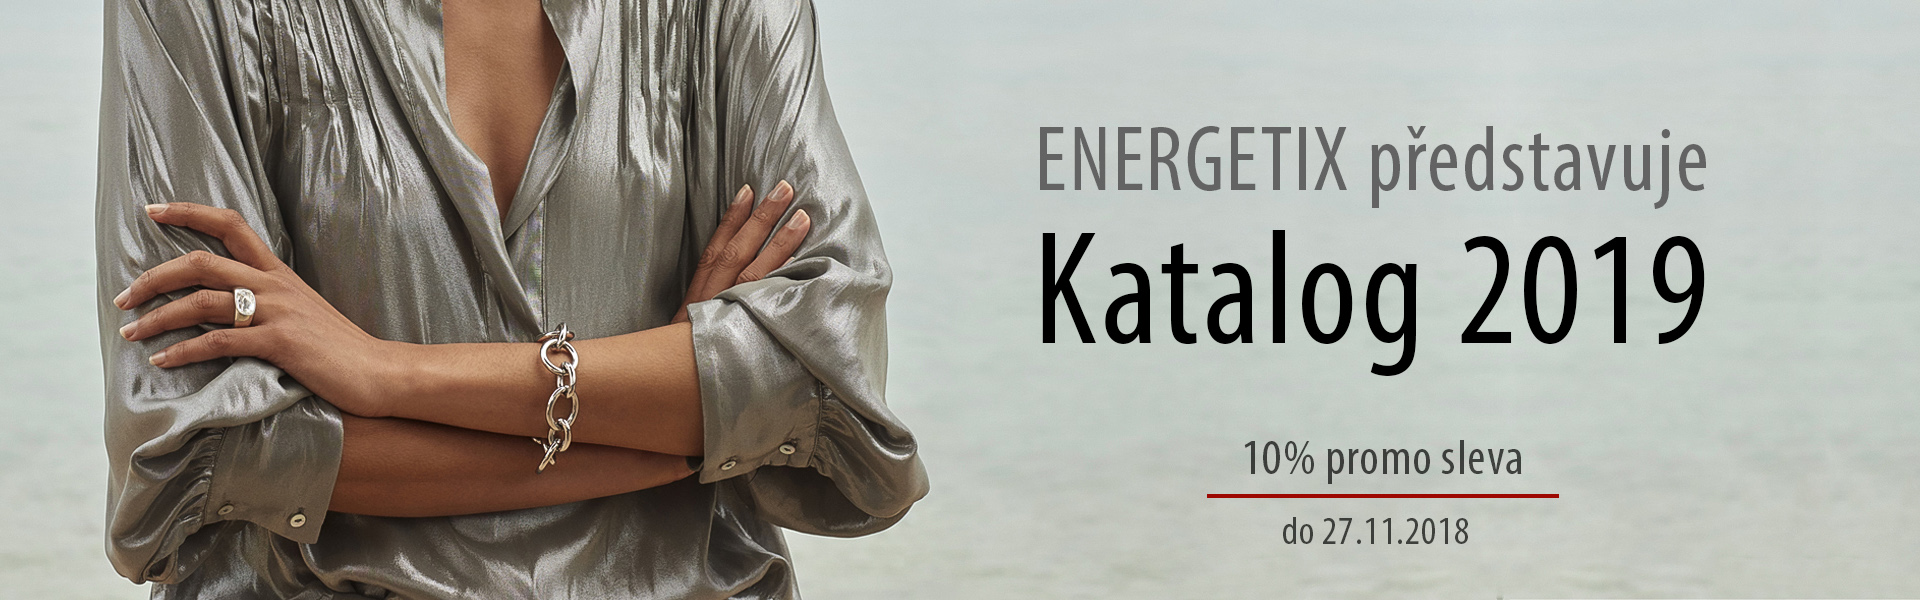 Katalog 2019 Energetix